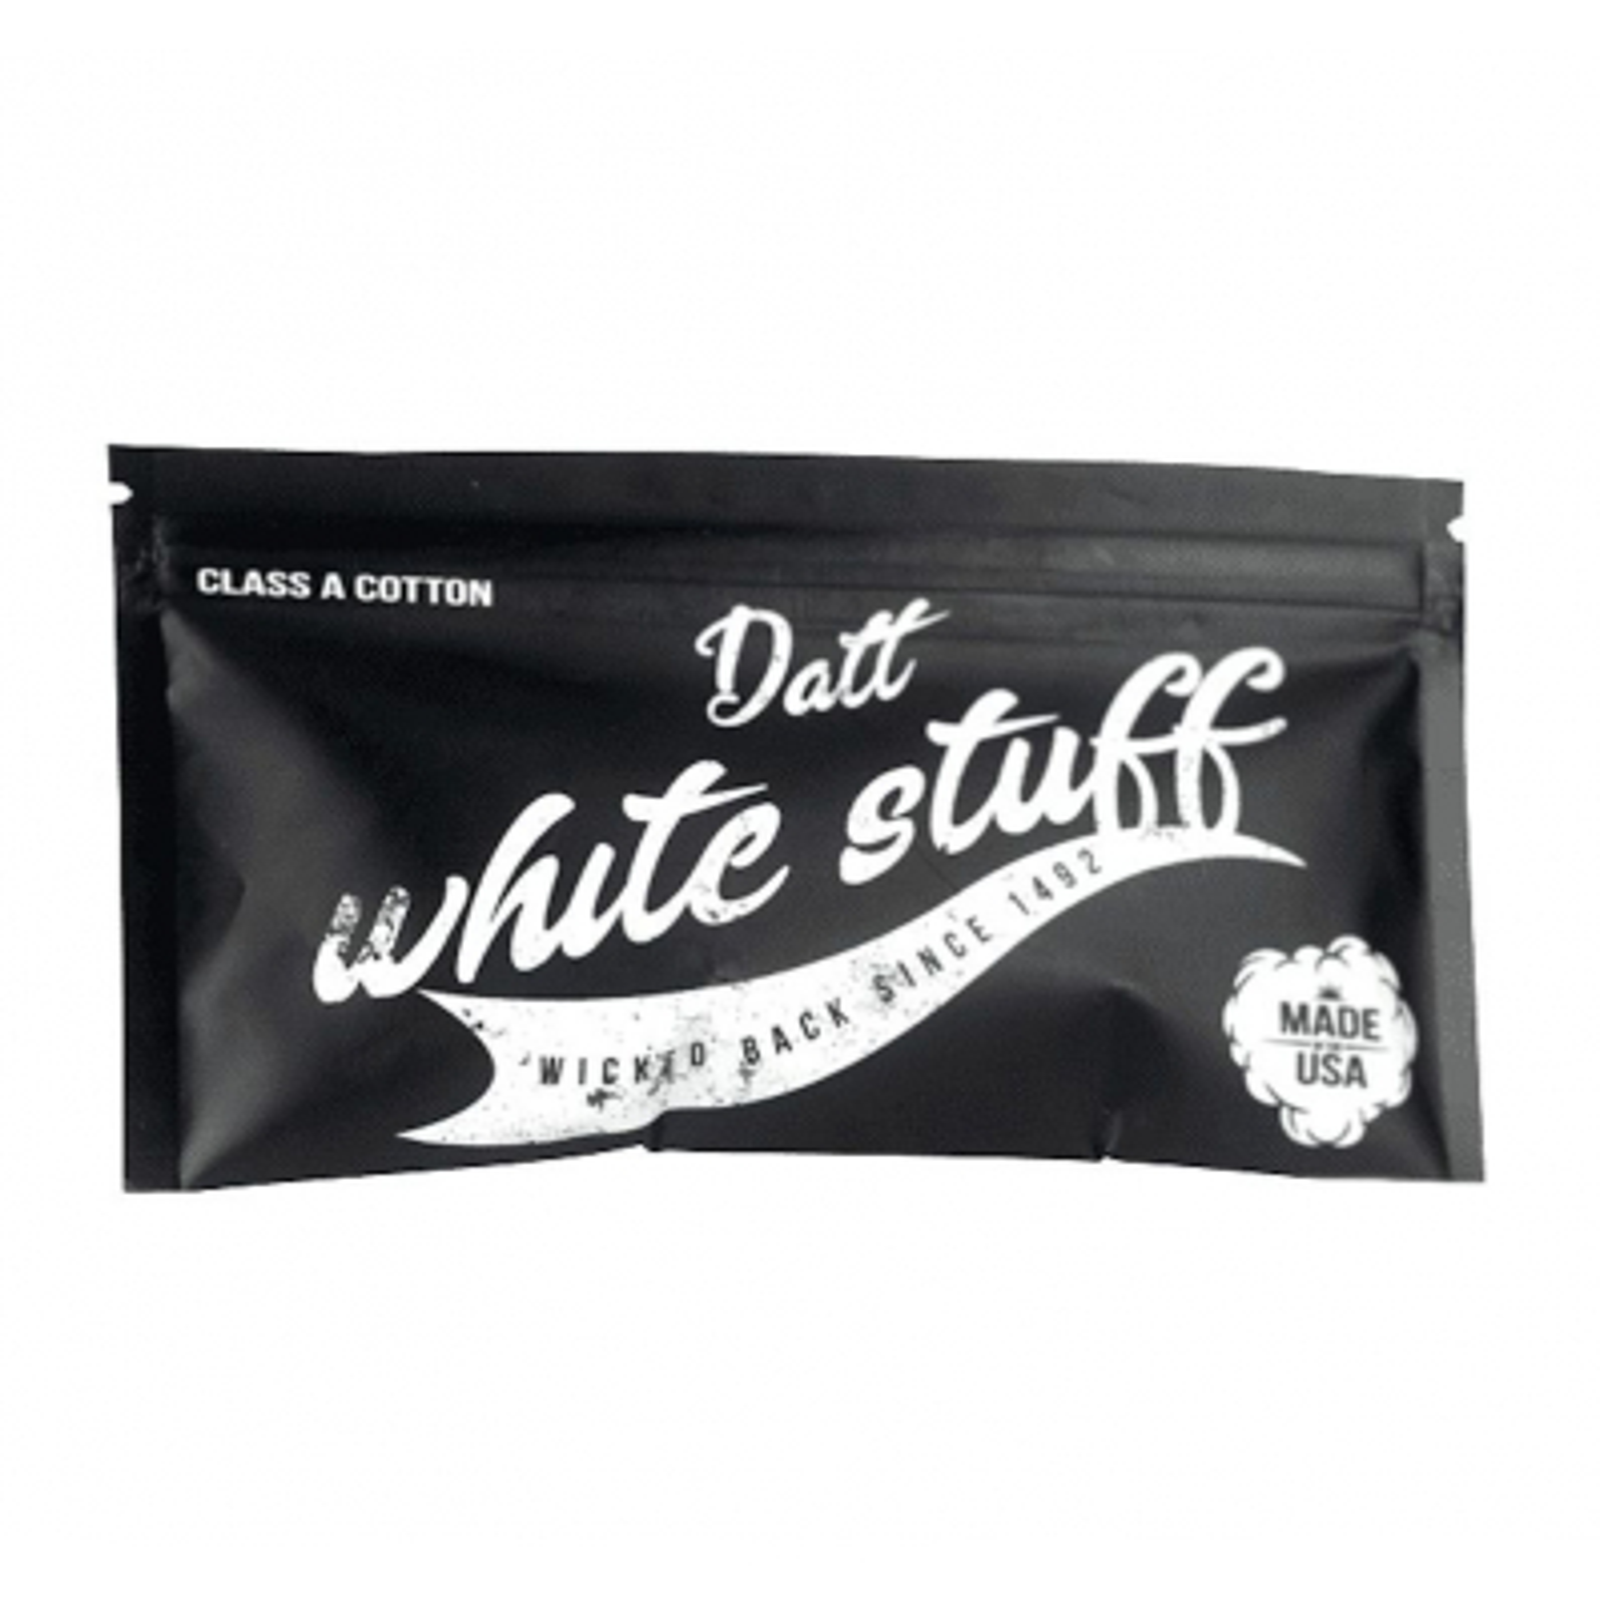 Datt Cotton - Datt White Stuff